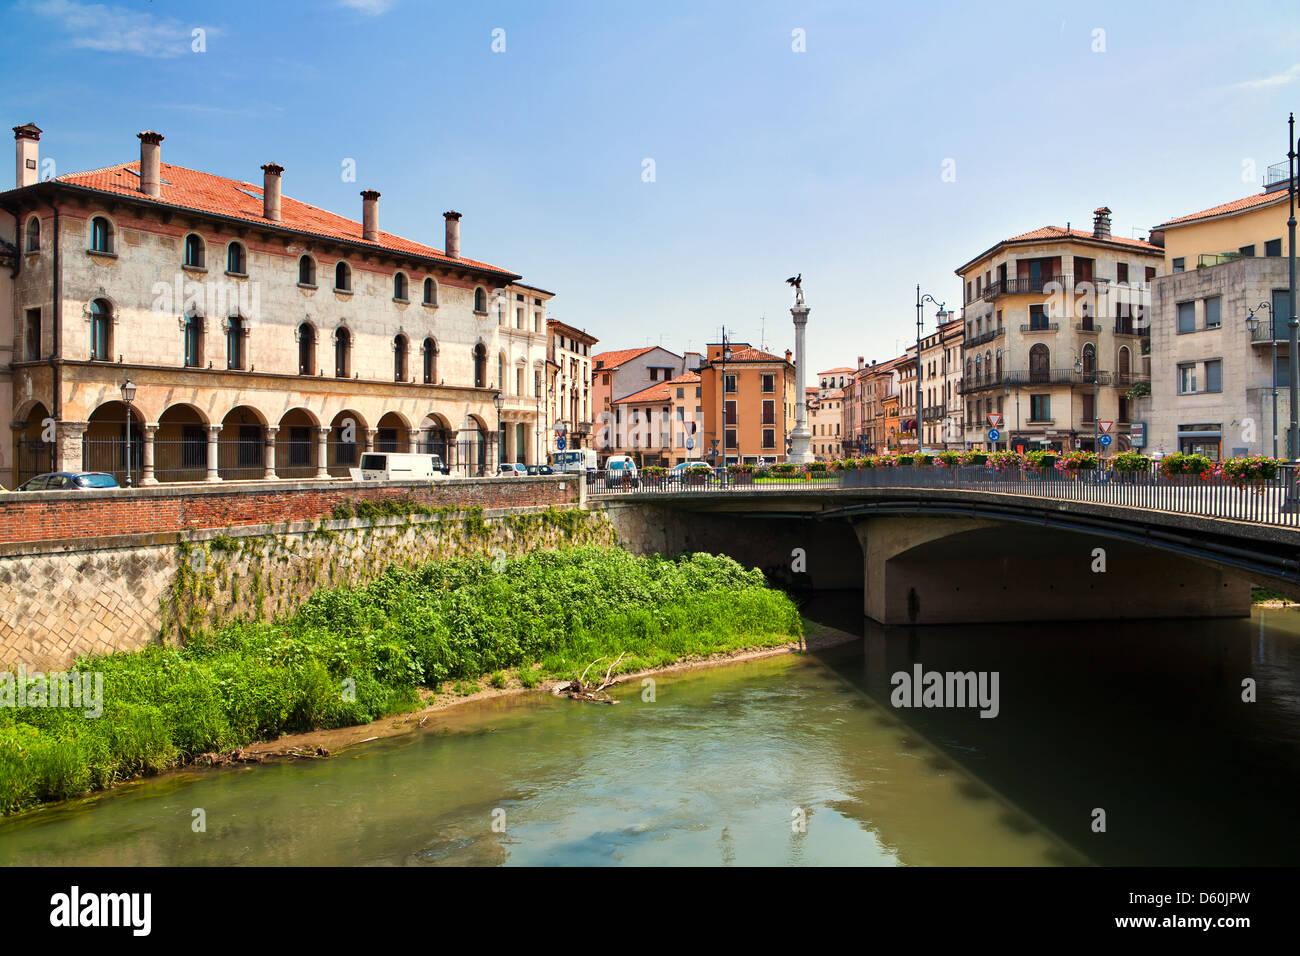 Vicenza, Italy - Stock Image